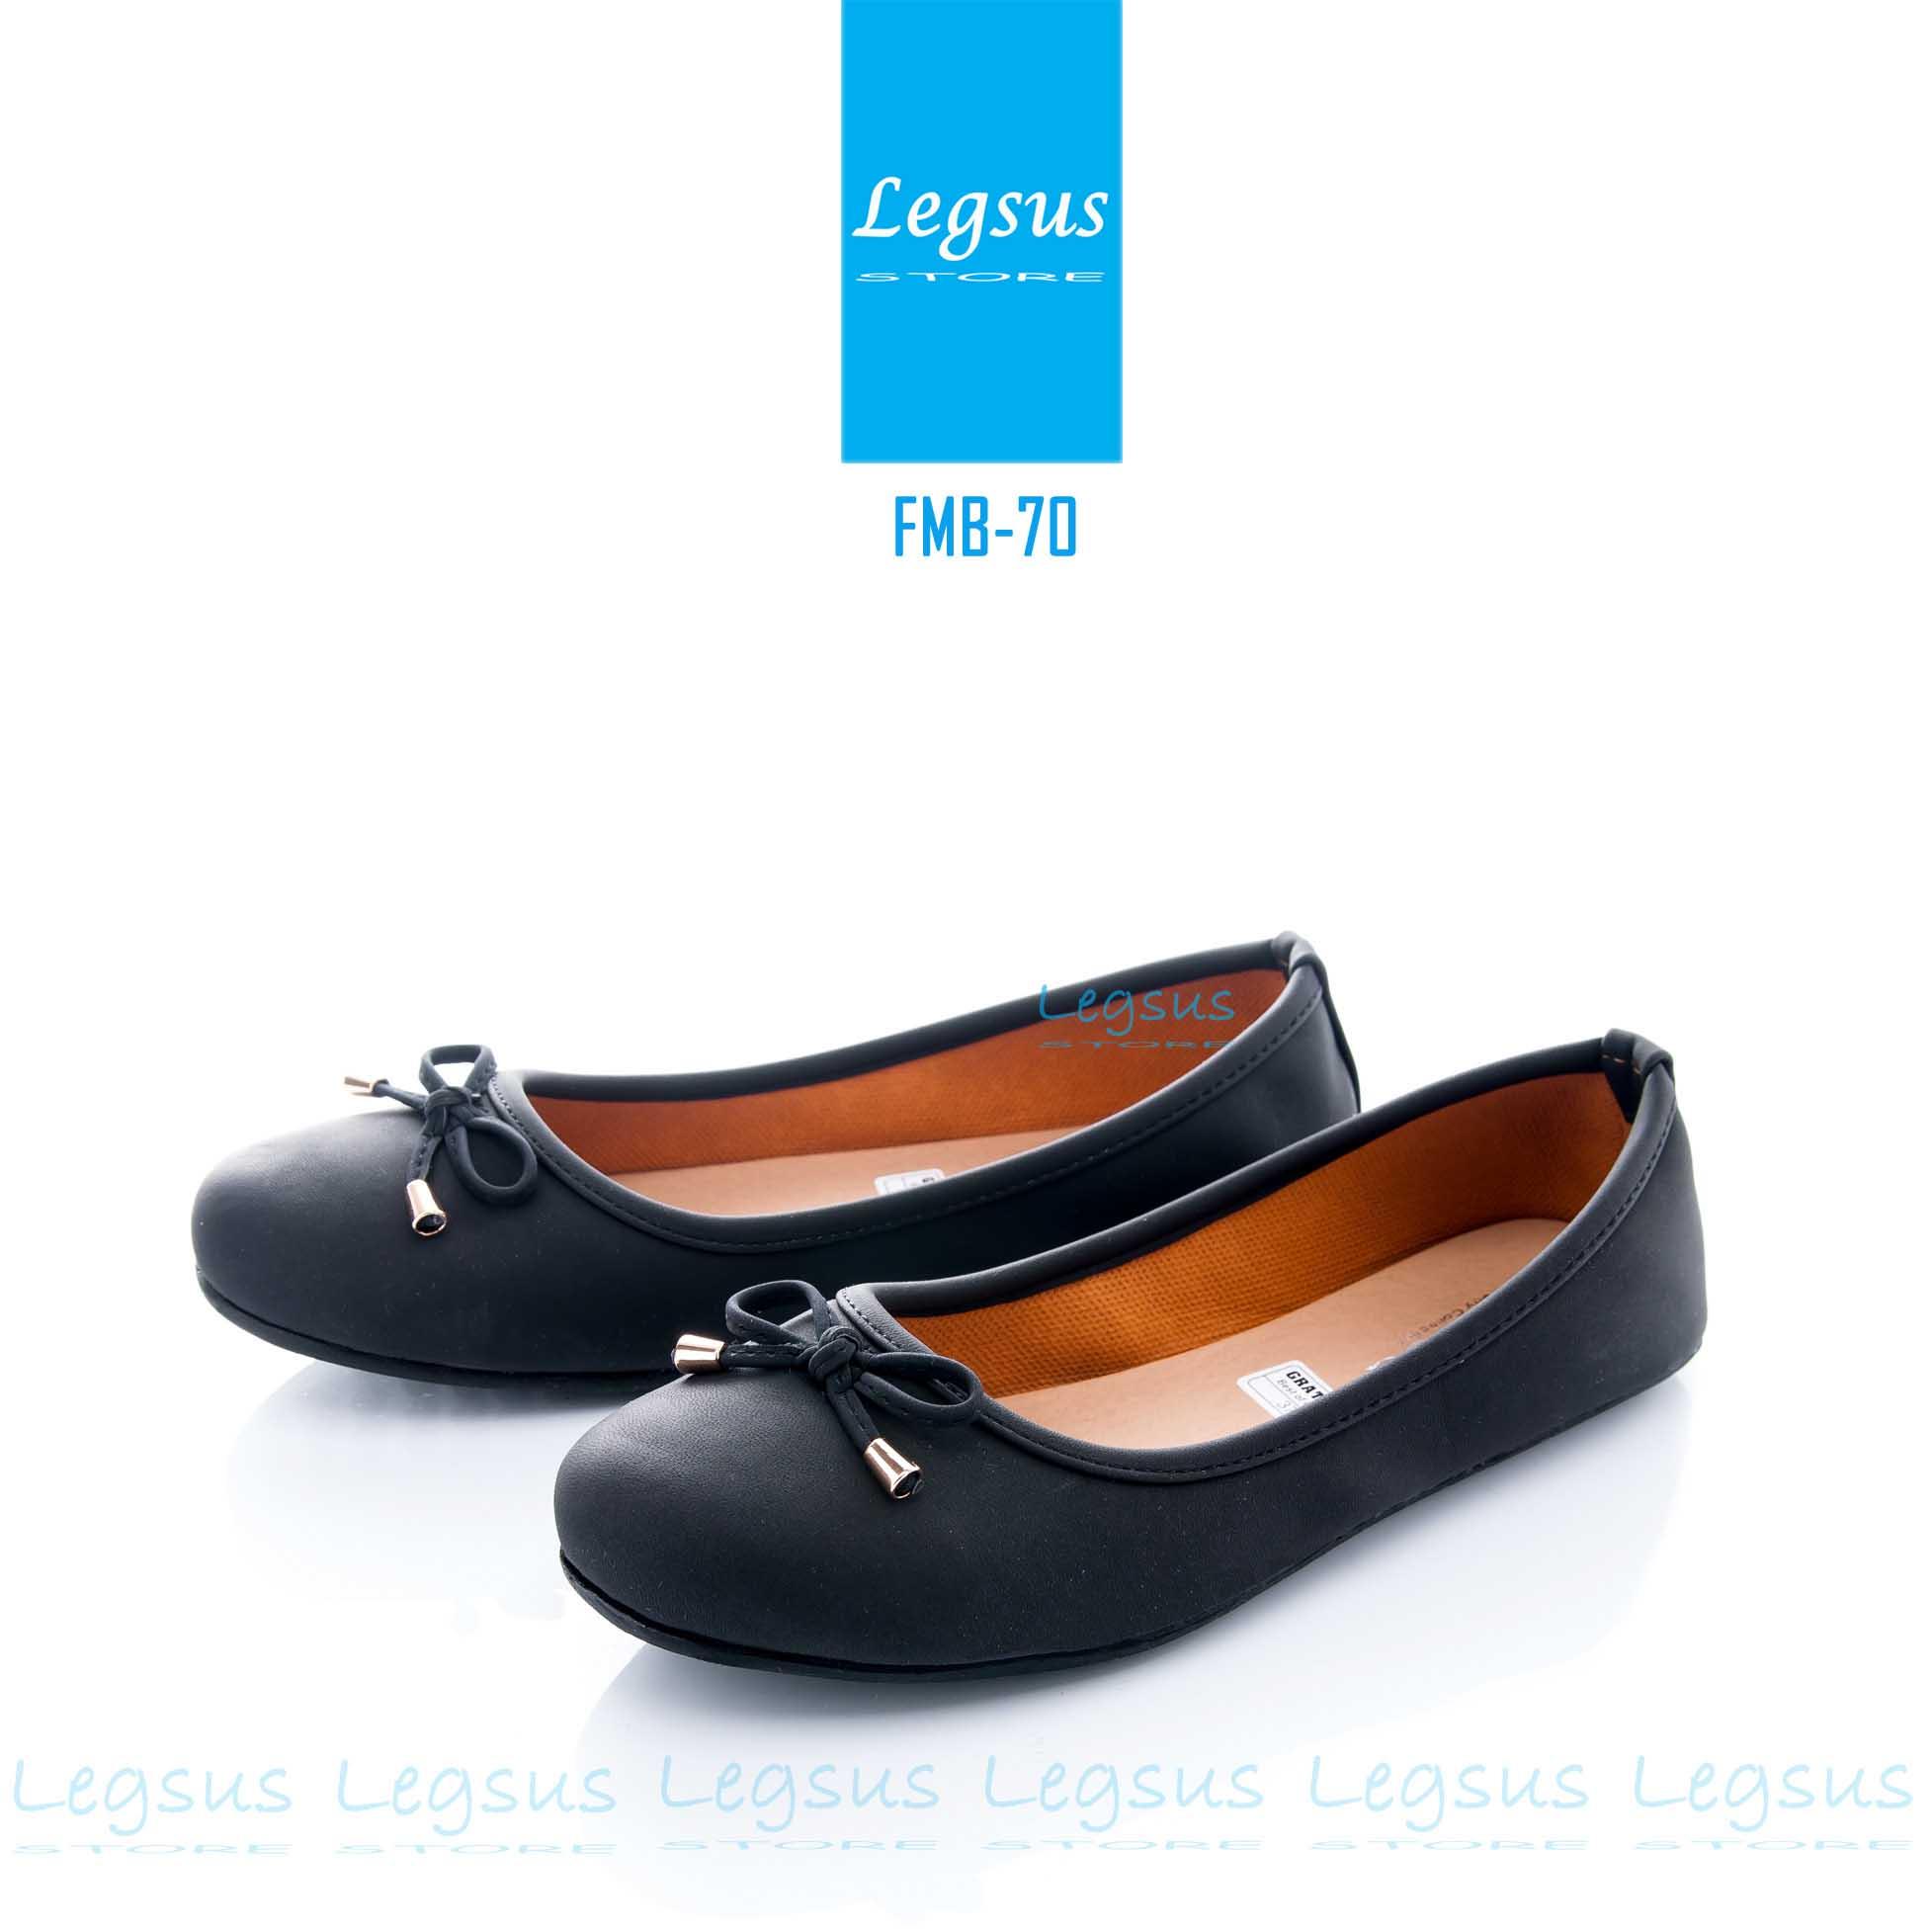 Sepatu Flat Shoes Wanita Hitam Sepatu Teplek Sepatu Simple FMB 70